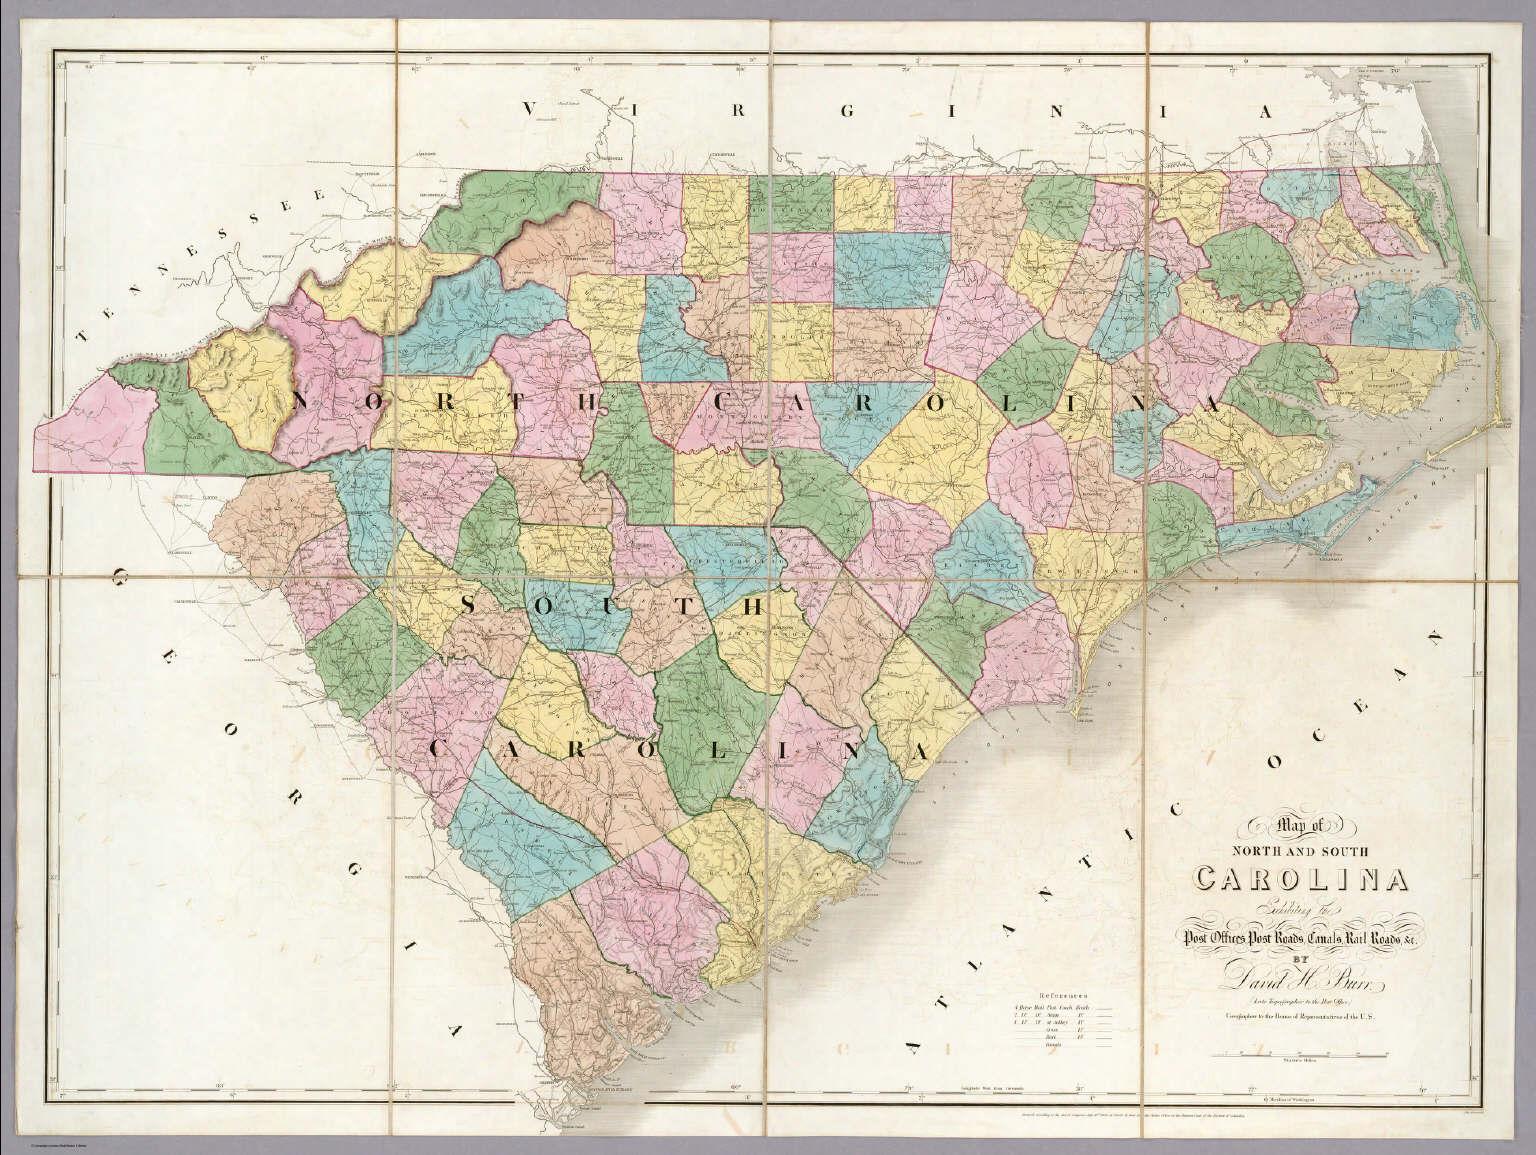 North and south carolina map sustrainability north and south carolina map publicscrutiny Gallery